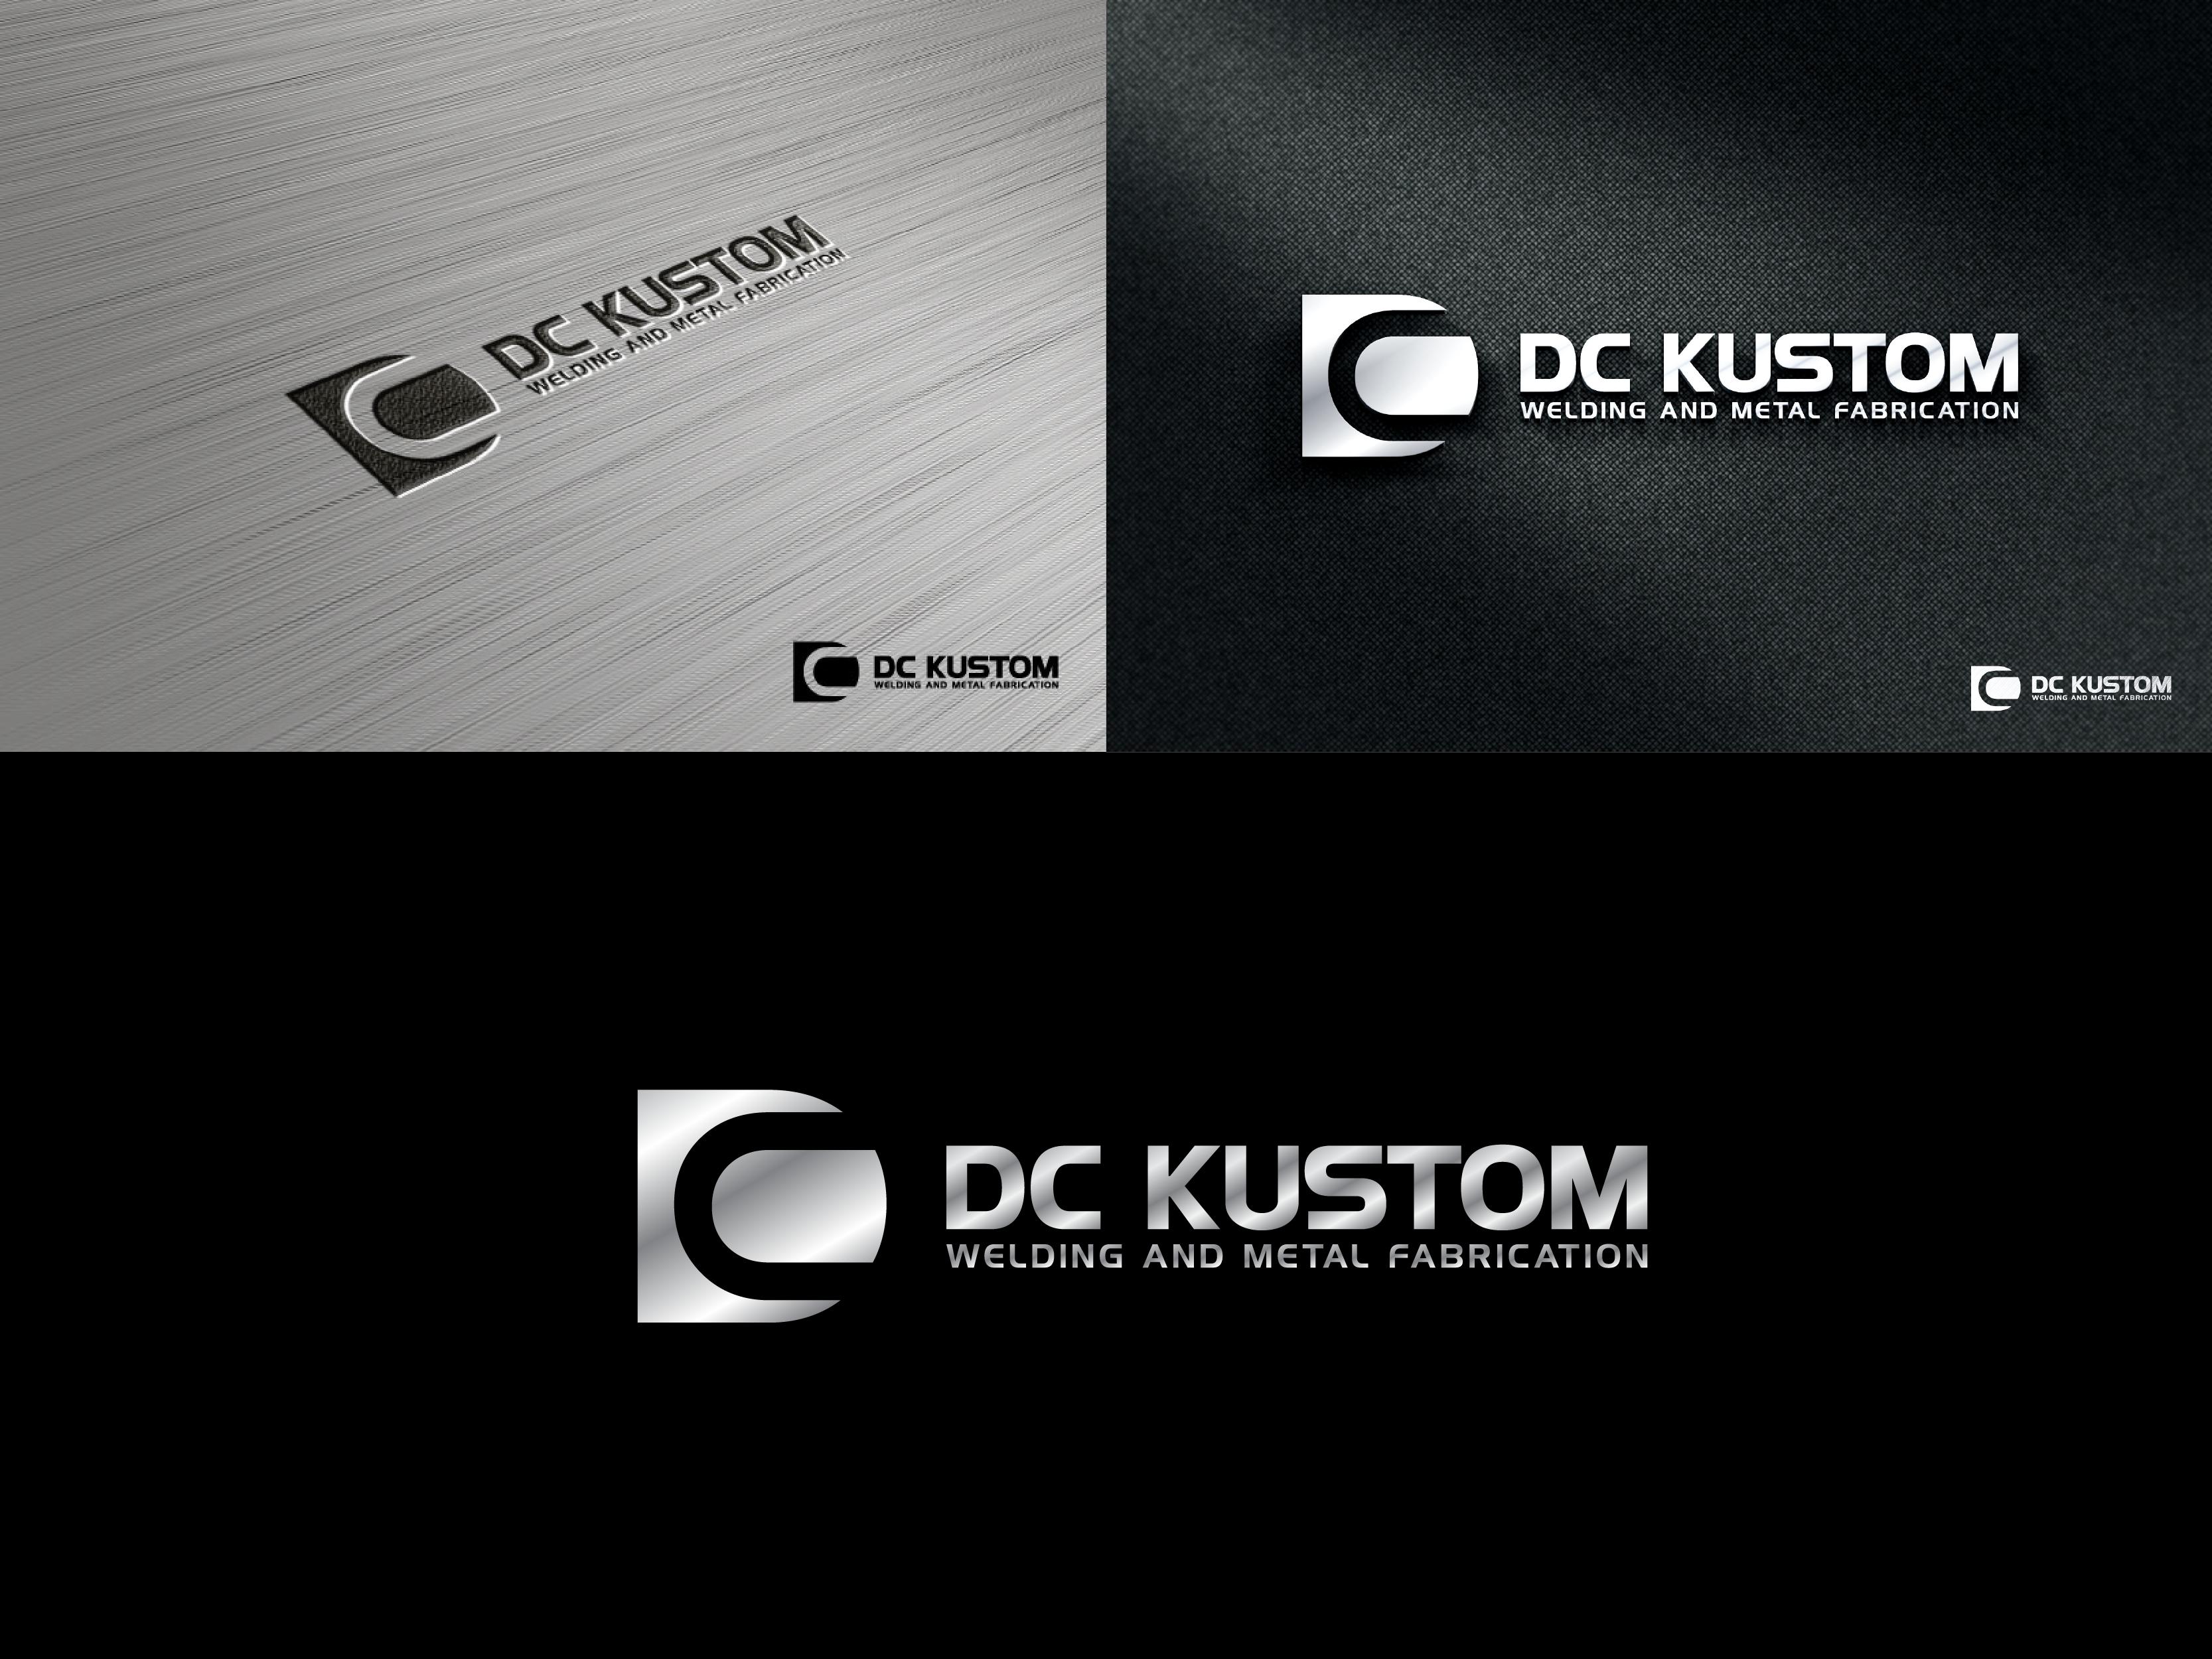 Logo Design by Shivaprasad Sangondimath - Entry No. 94 in the Logo Design Contest Imaginative Logo Design for DC KUSTOM WELDING & METAL FABRICATION.